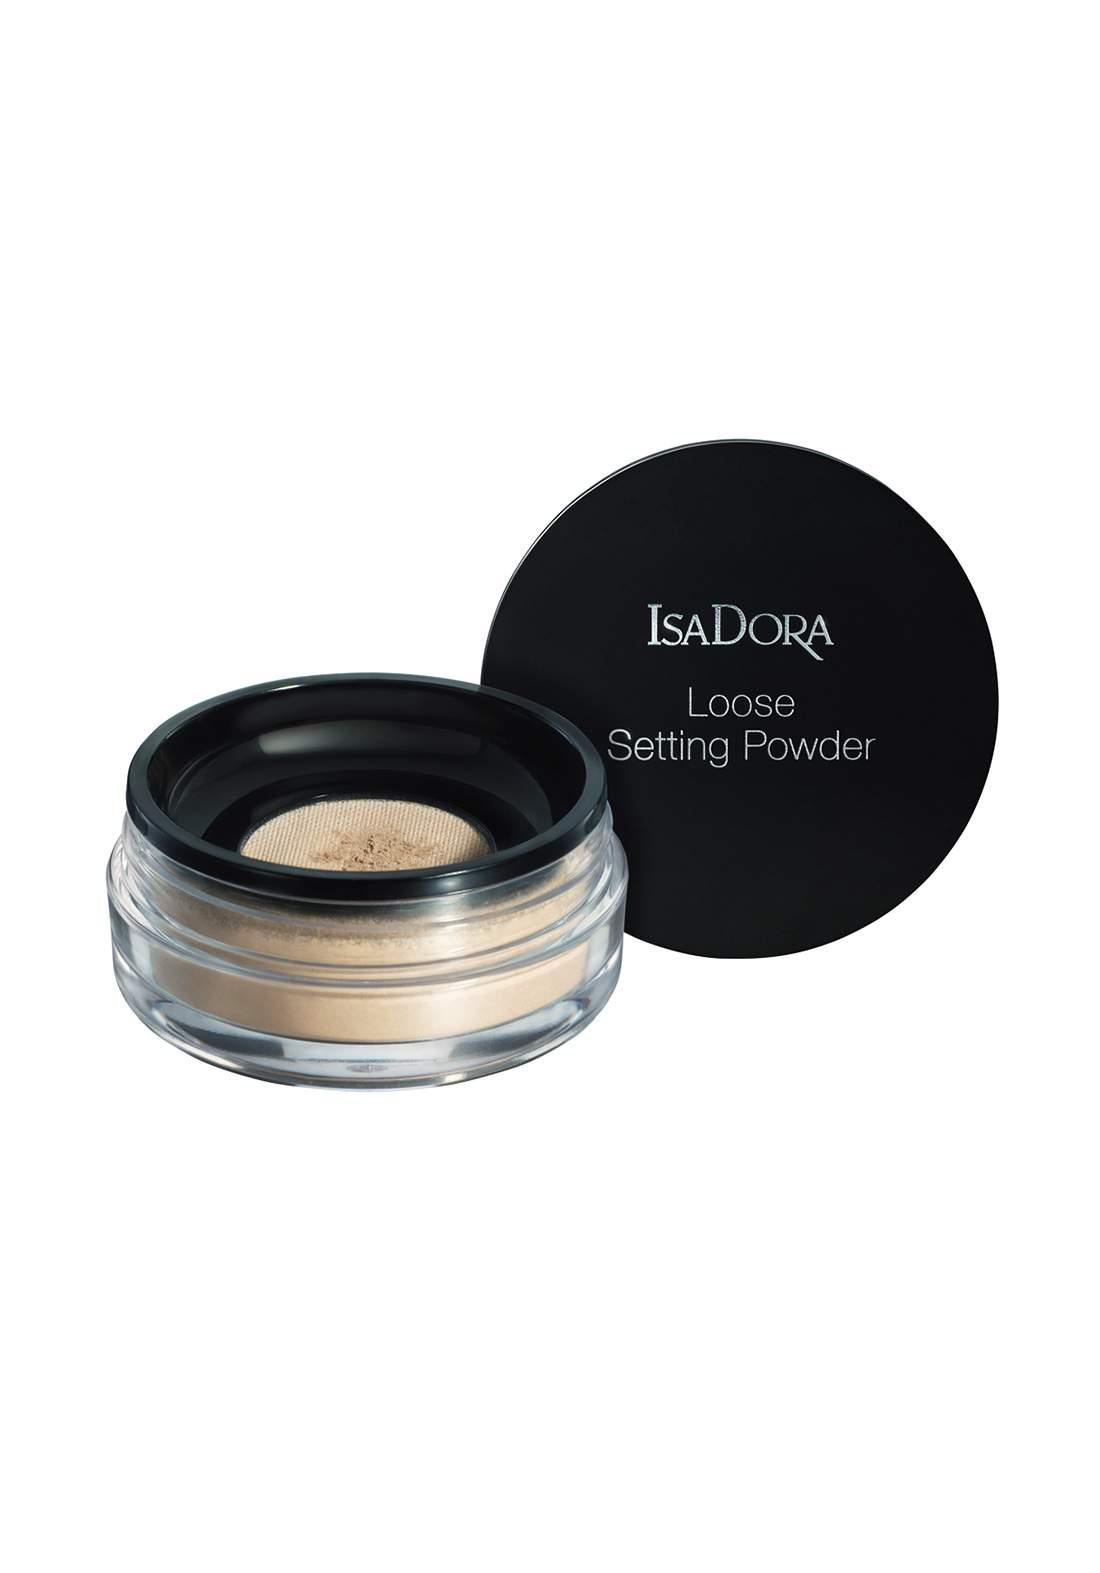 IsaDora 316545 Loose Setting Powder Fair No.03 بودرة تثبيت سائبة